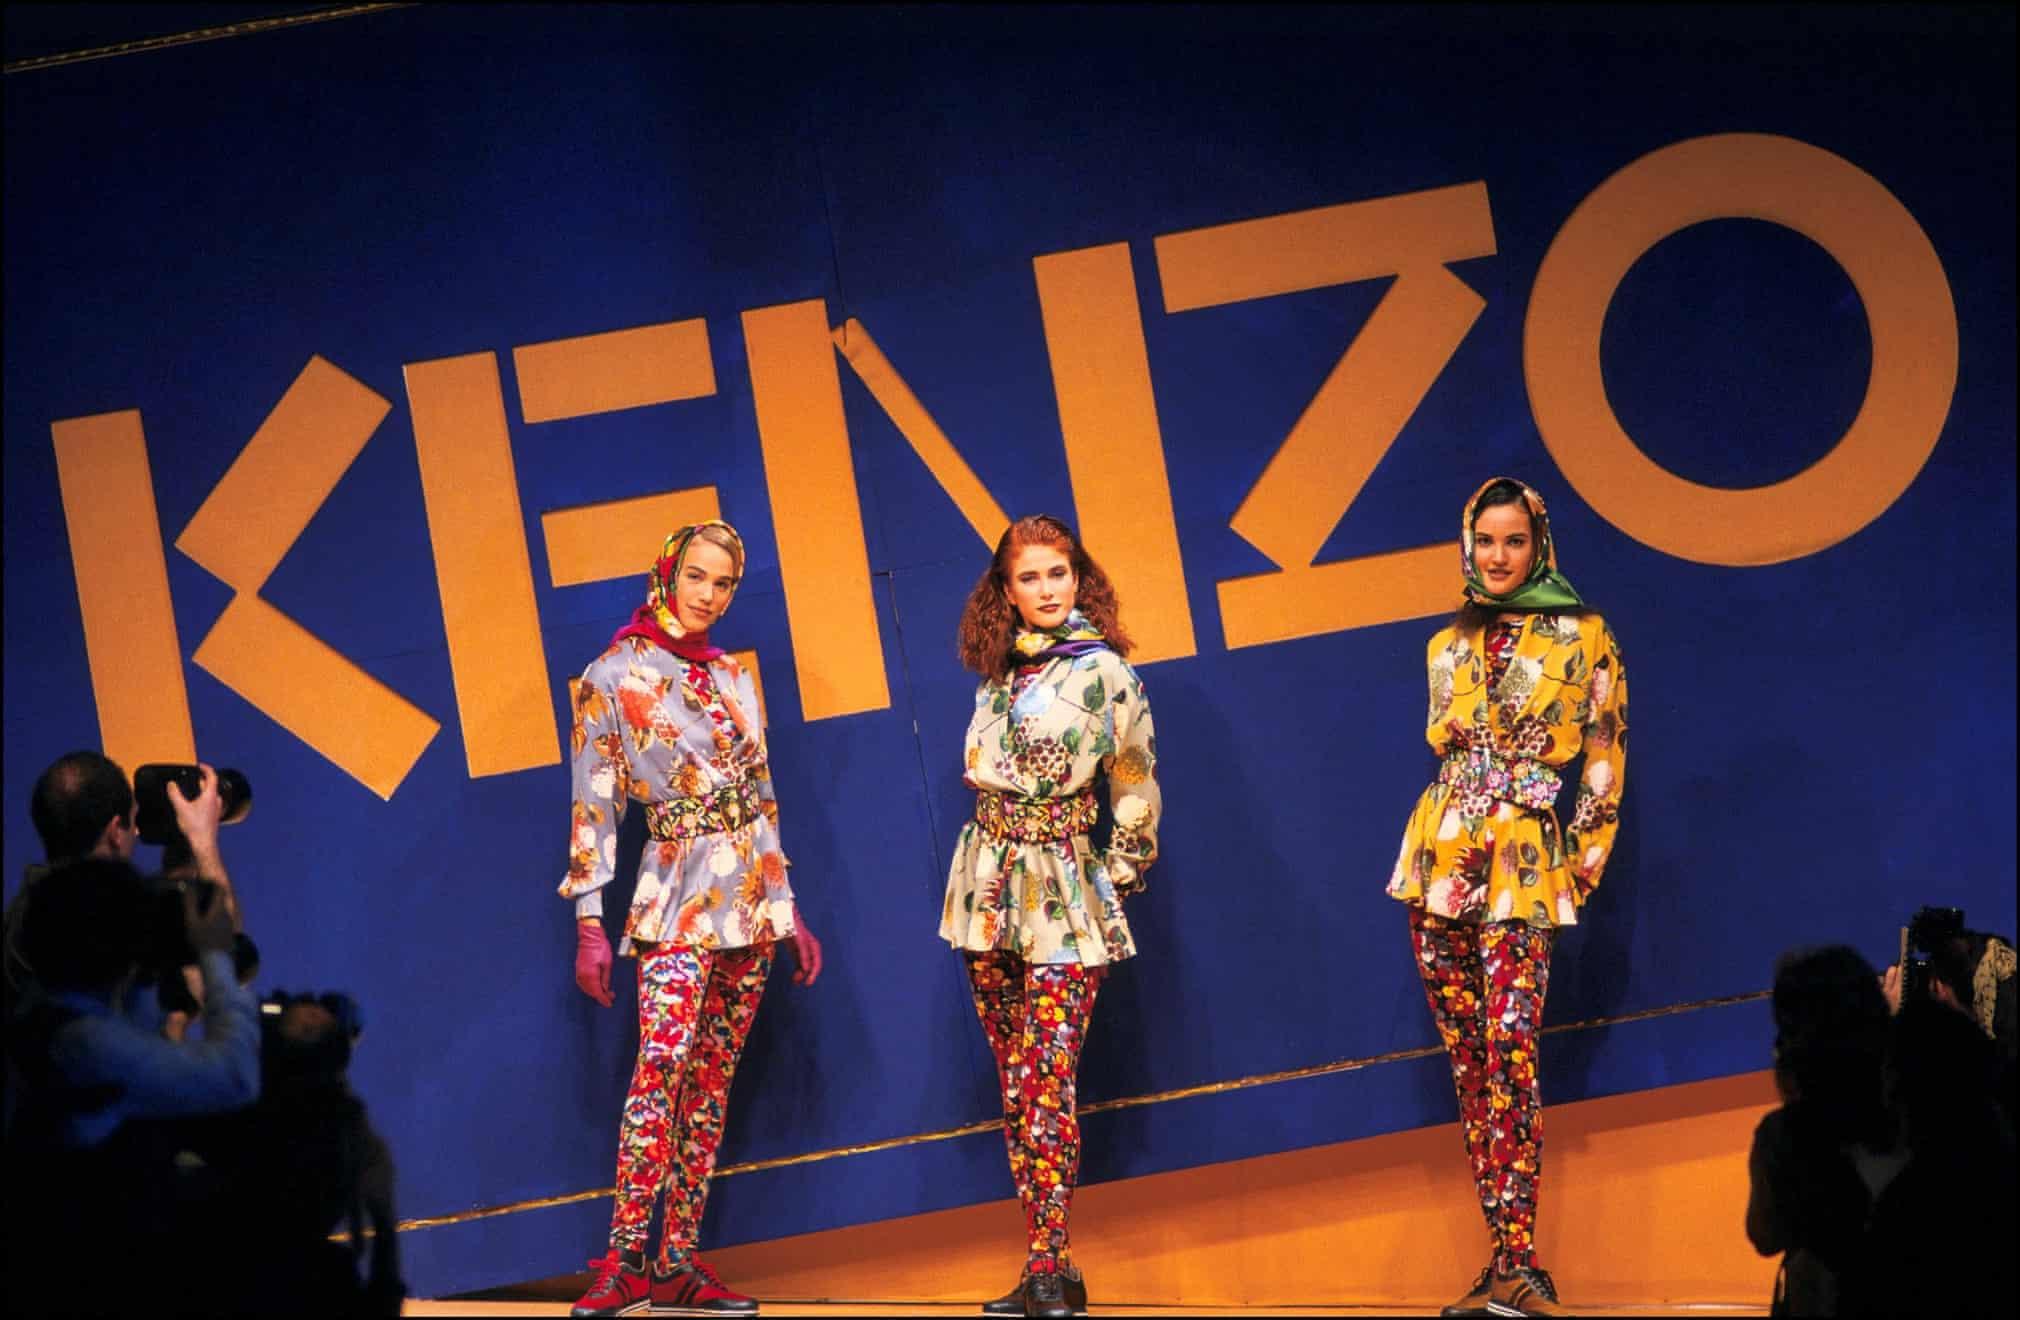 kenzo runway - Gli abiti felici di Kenzō